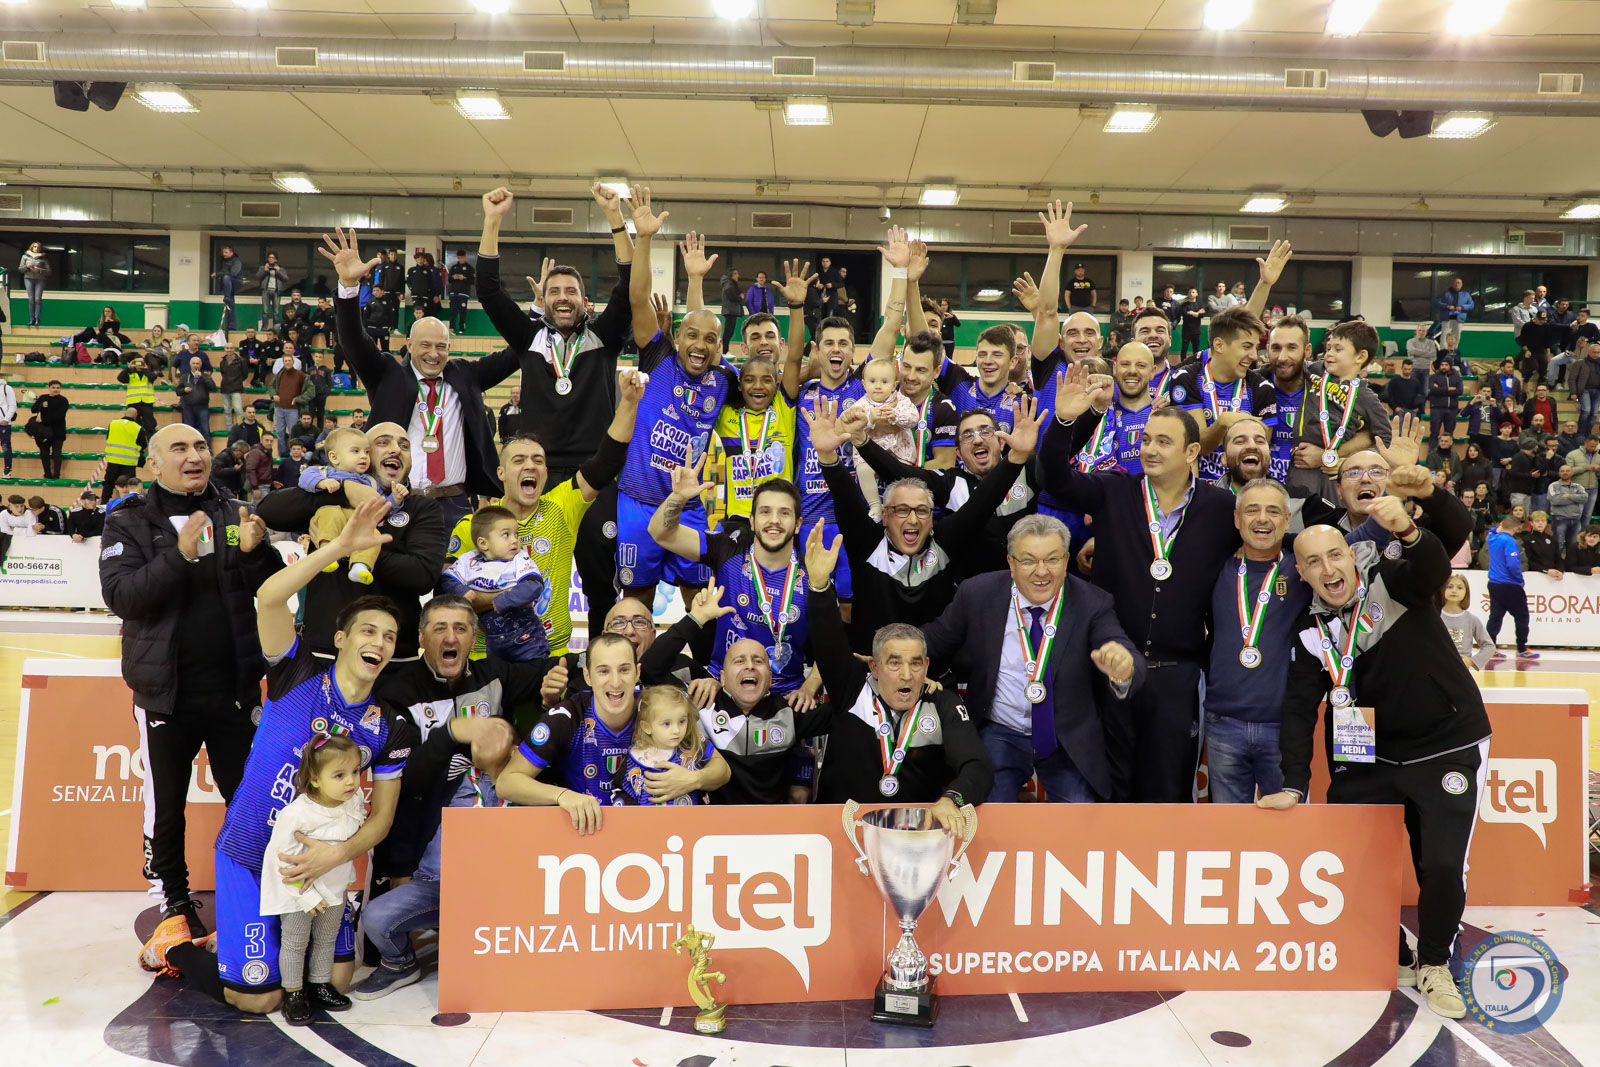 Supercoppa_A&S-NAP_181130-188